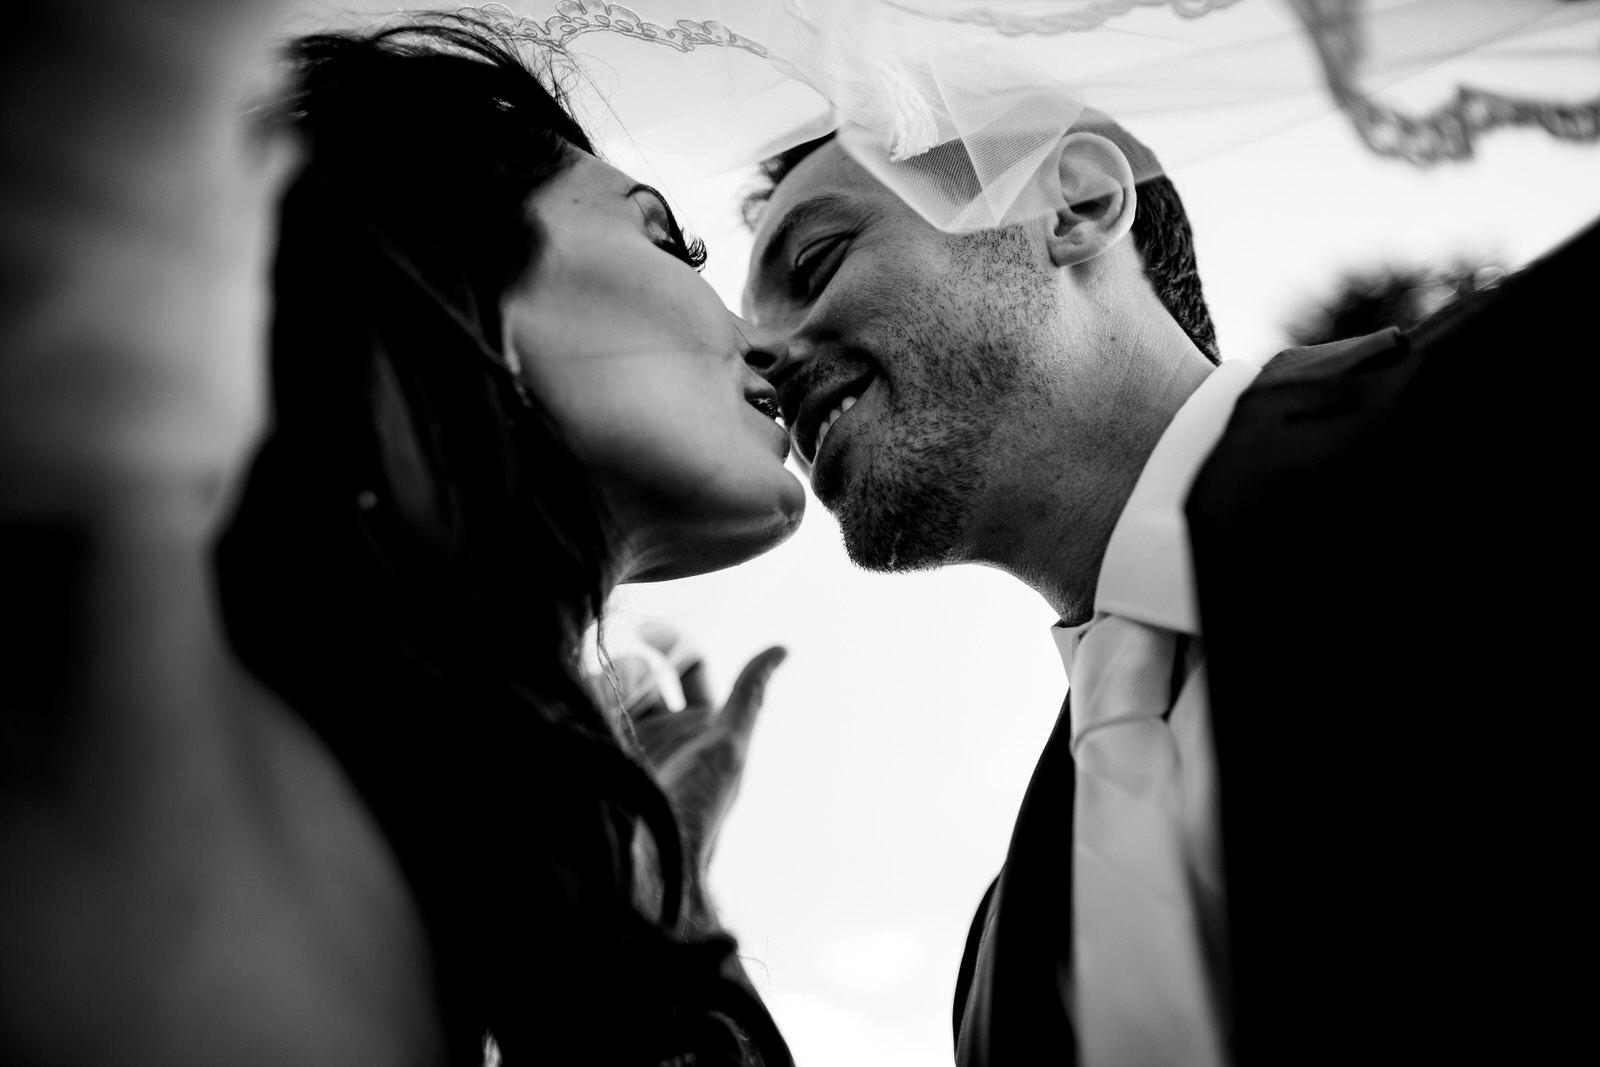 bride_and_groom_jensen_beach_wedding_day-174.jpg